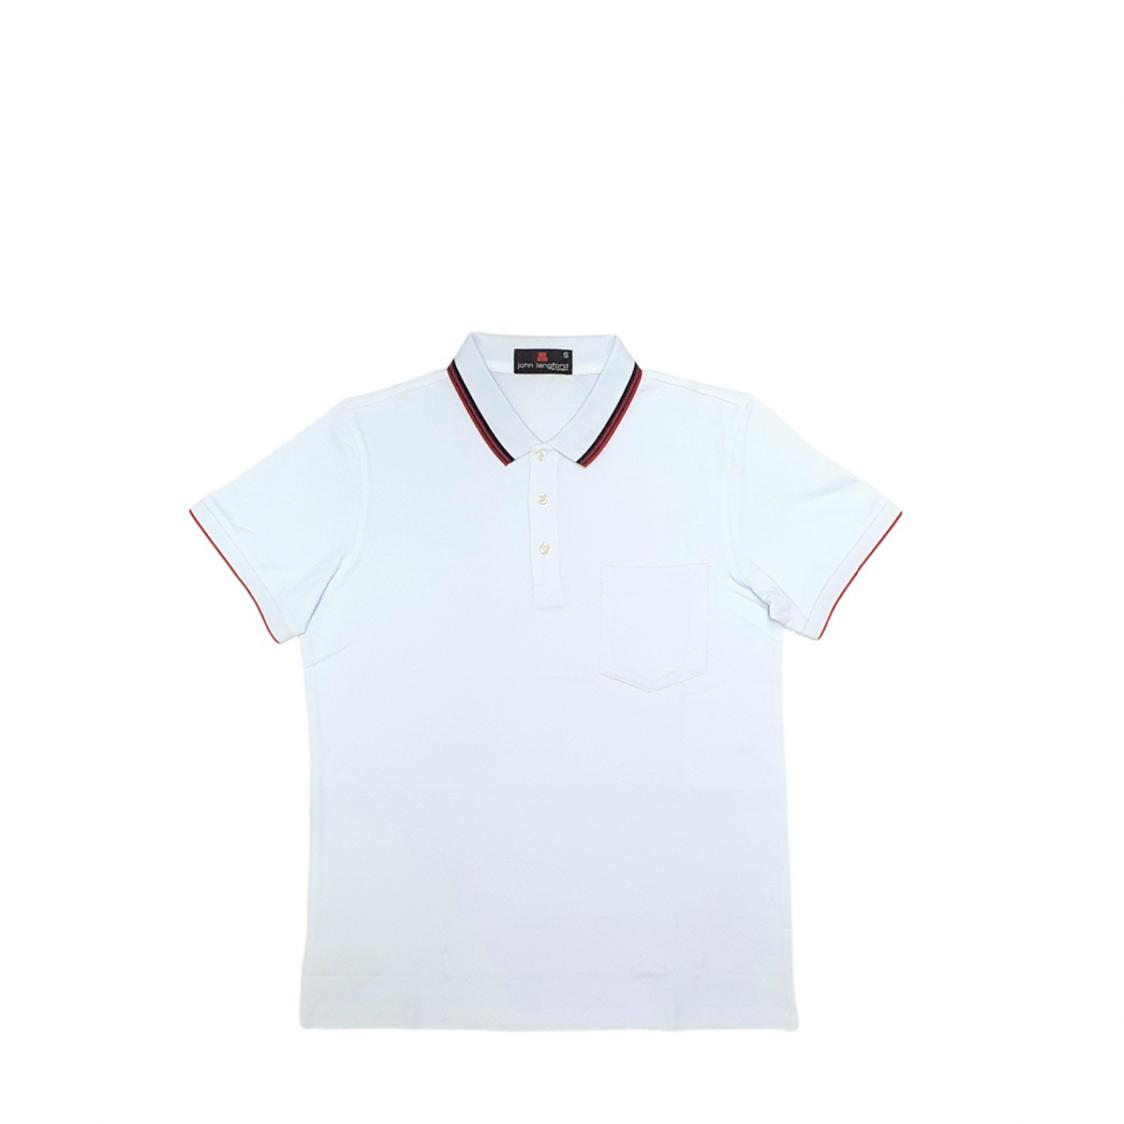 John Langford Pique Polo T-Shirt with Pocket White